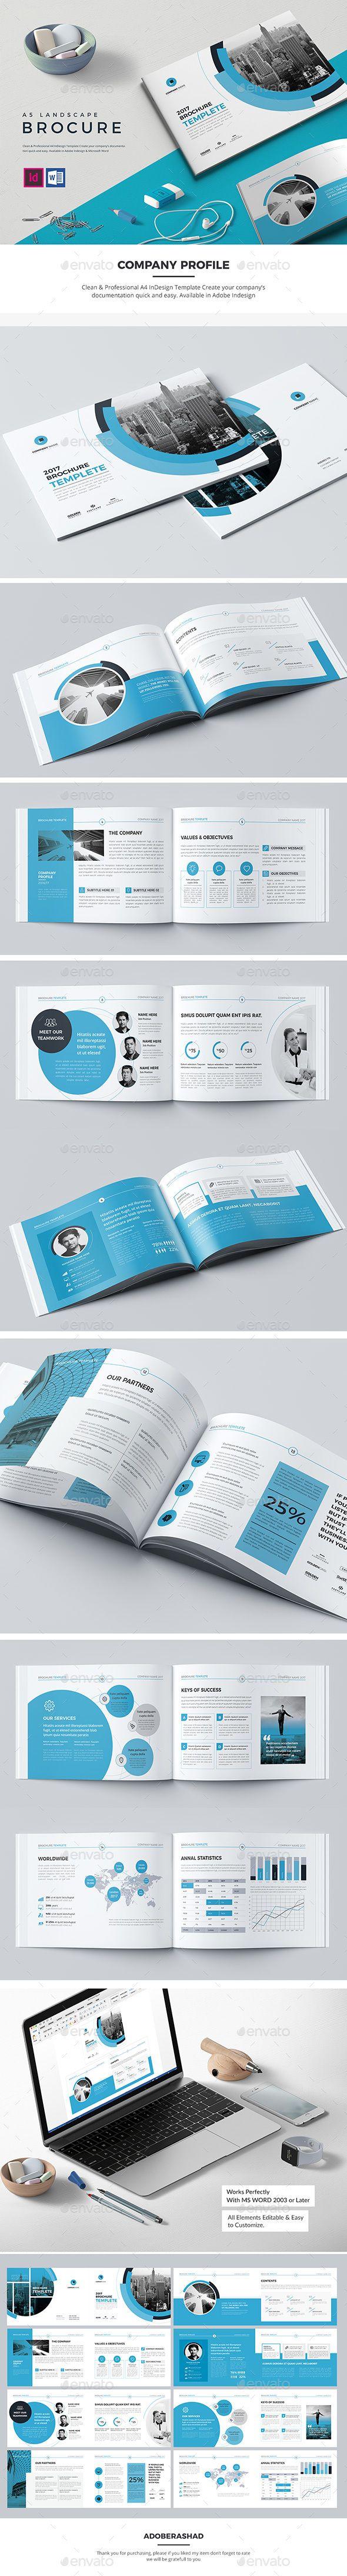 Co Landscape Brochure Template InDesign INDD - 16 Pages